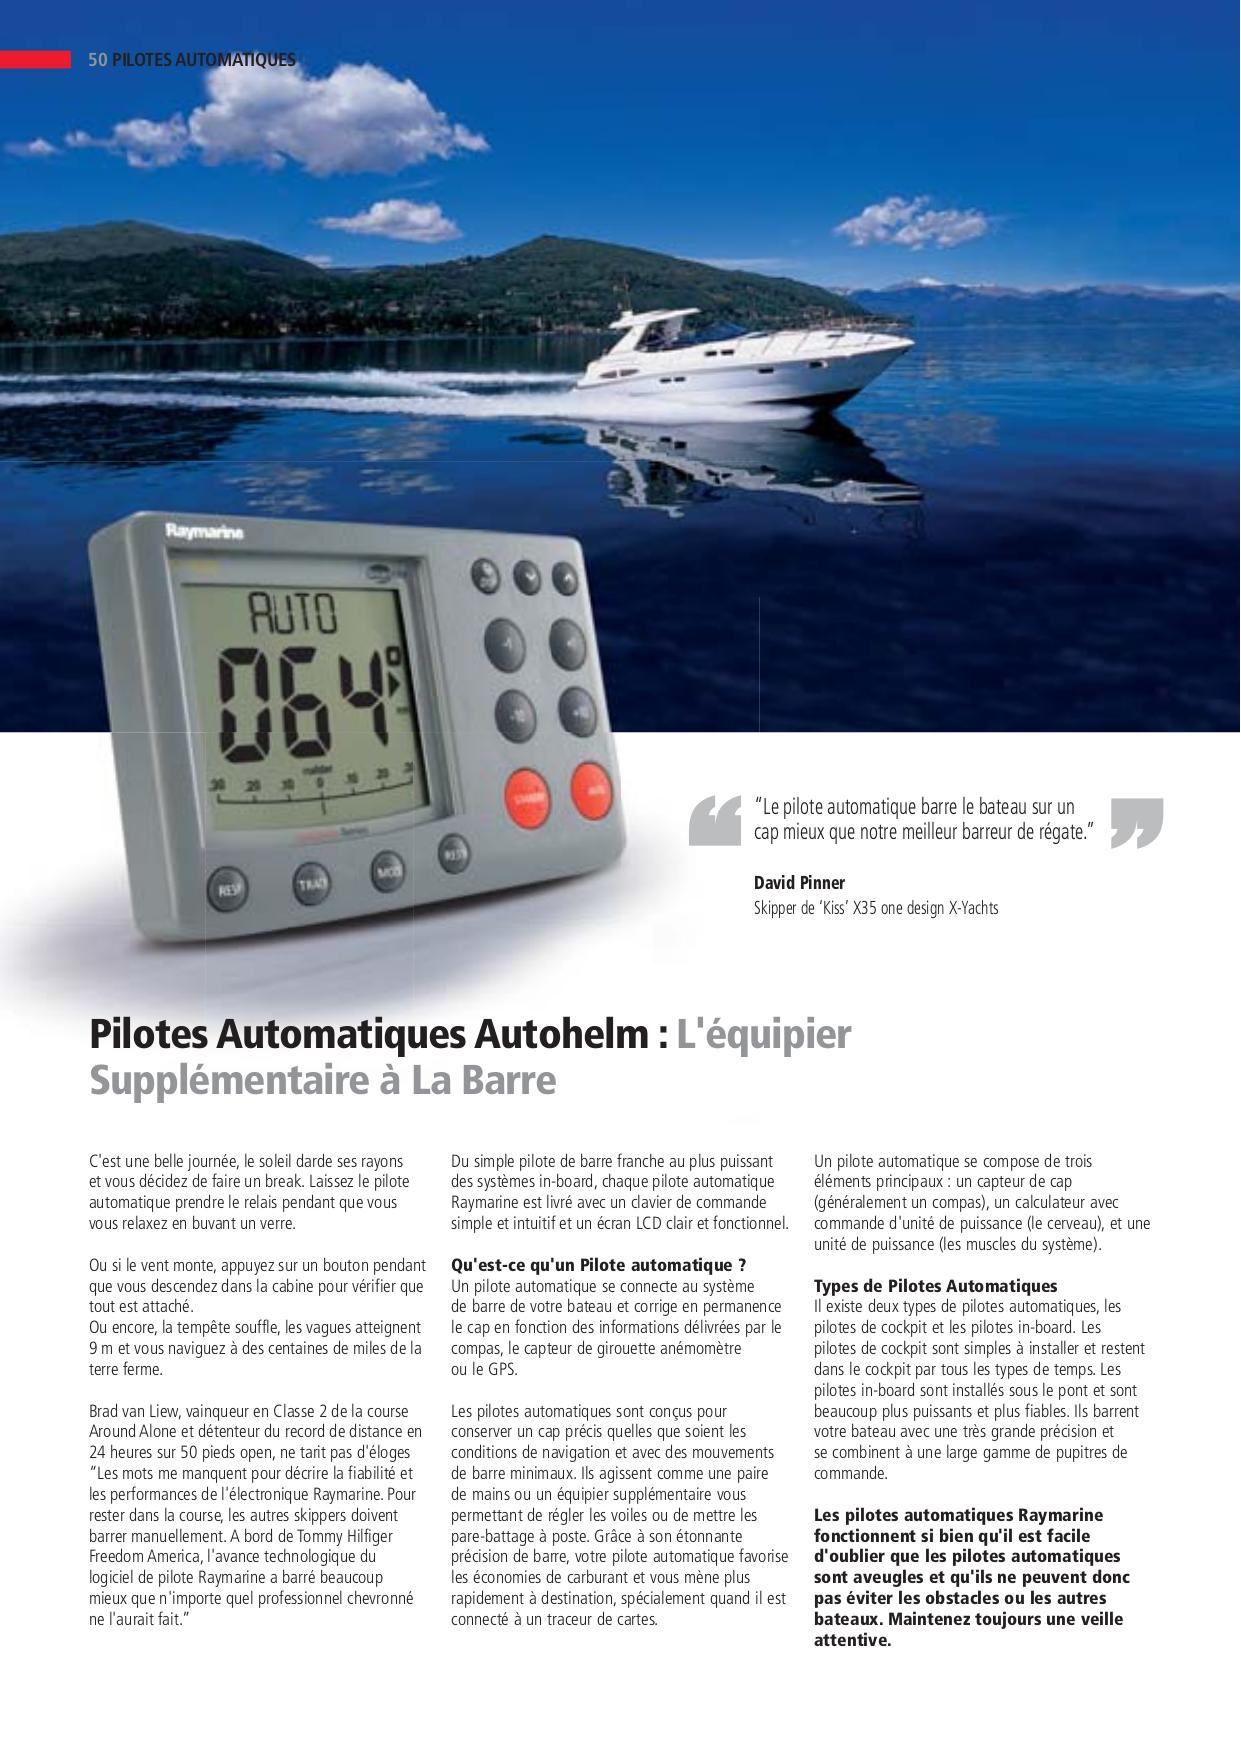 download free pdf for raymarine autohelm st5000 gps manual rh umlib com Raymarine Autohelm 4000 ST60 Raymarine Autohelm